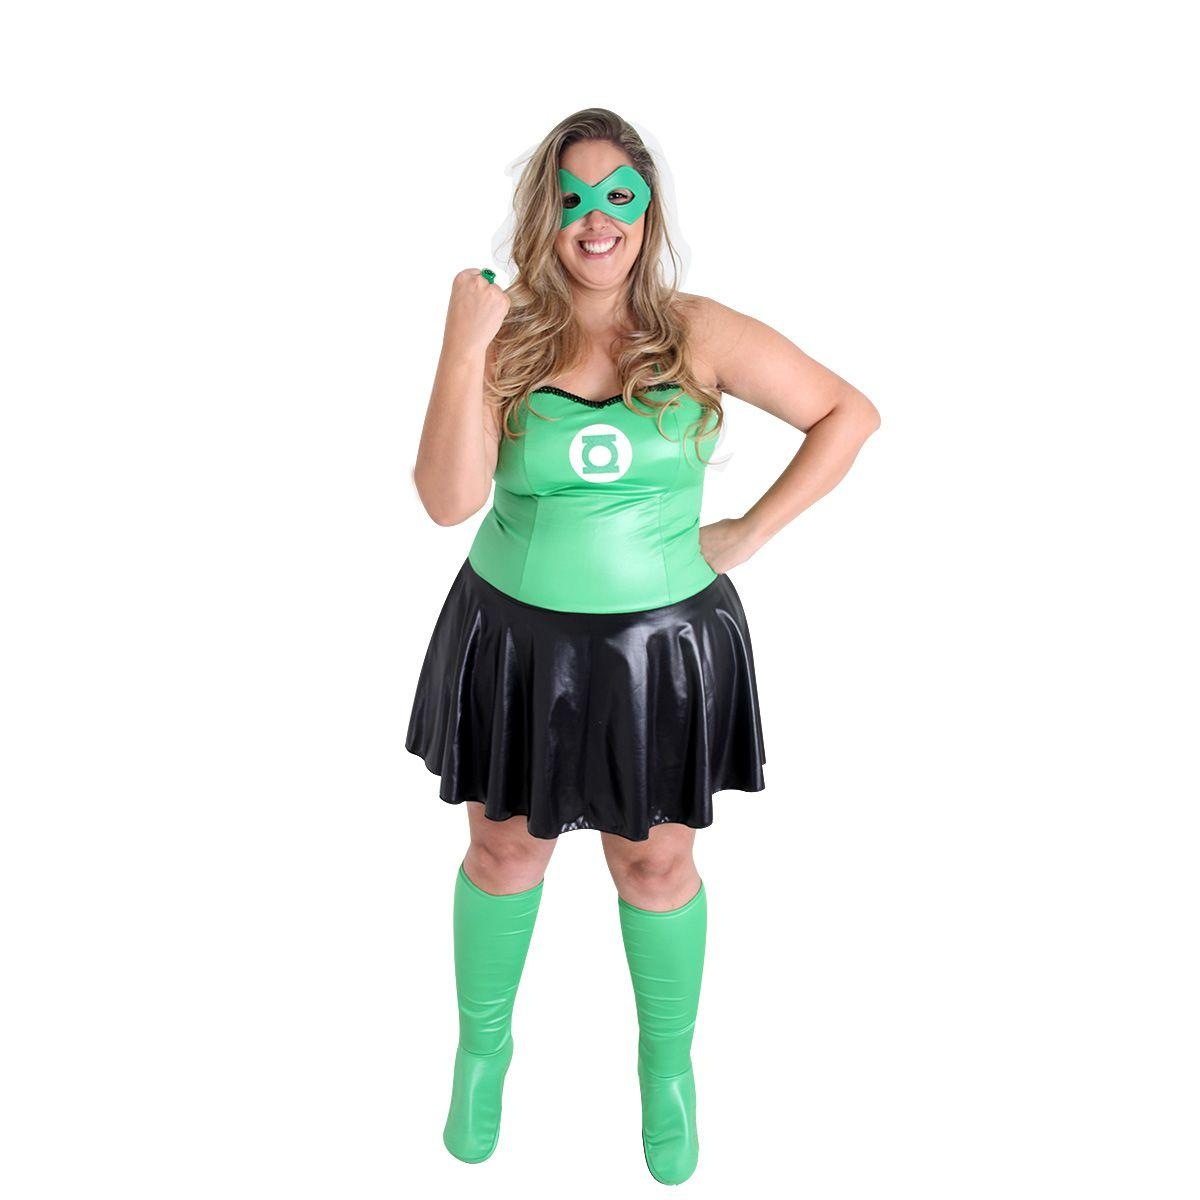 f26d7f9adf Fantasia Lanterna Verde Feminina - Plus Size - Liga da justiça - Fantasias  - Magazine Luiza